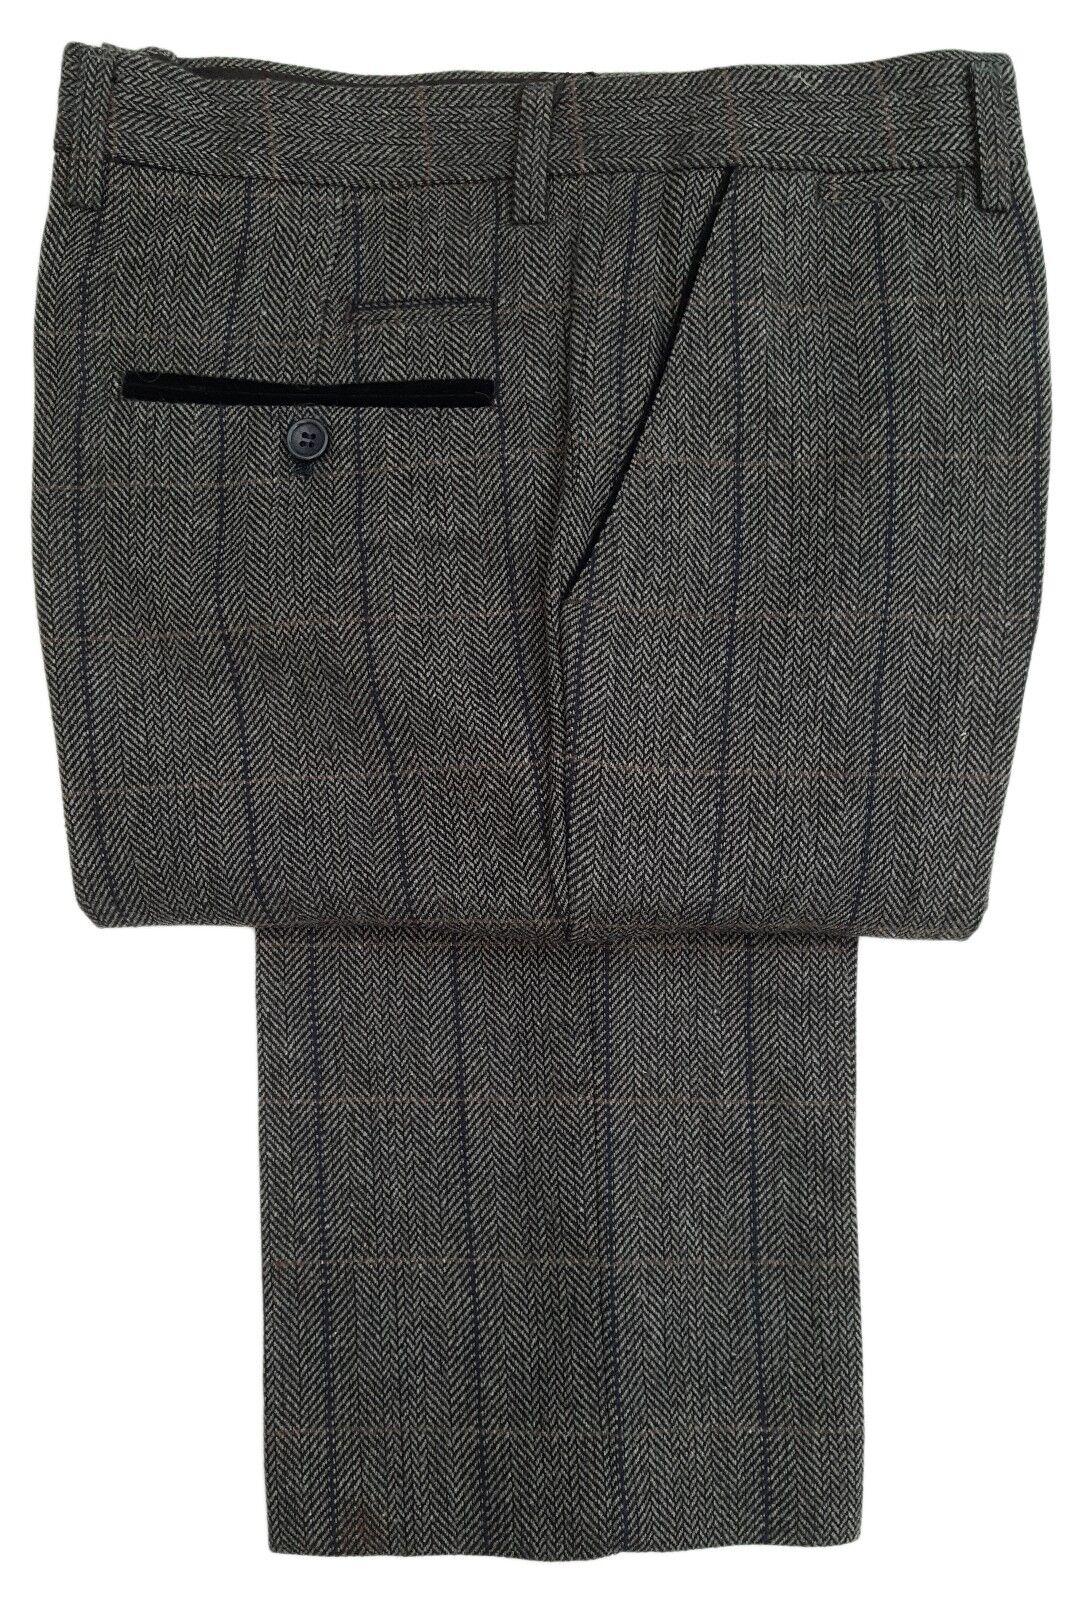 Herren Marc Darcy Tweed karierte Hose Style DX7 - dunkelgrau